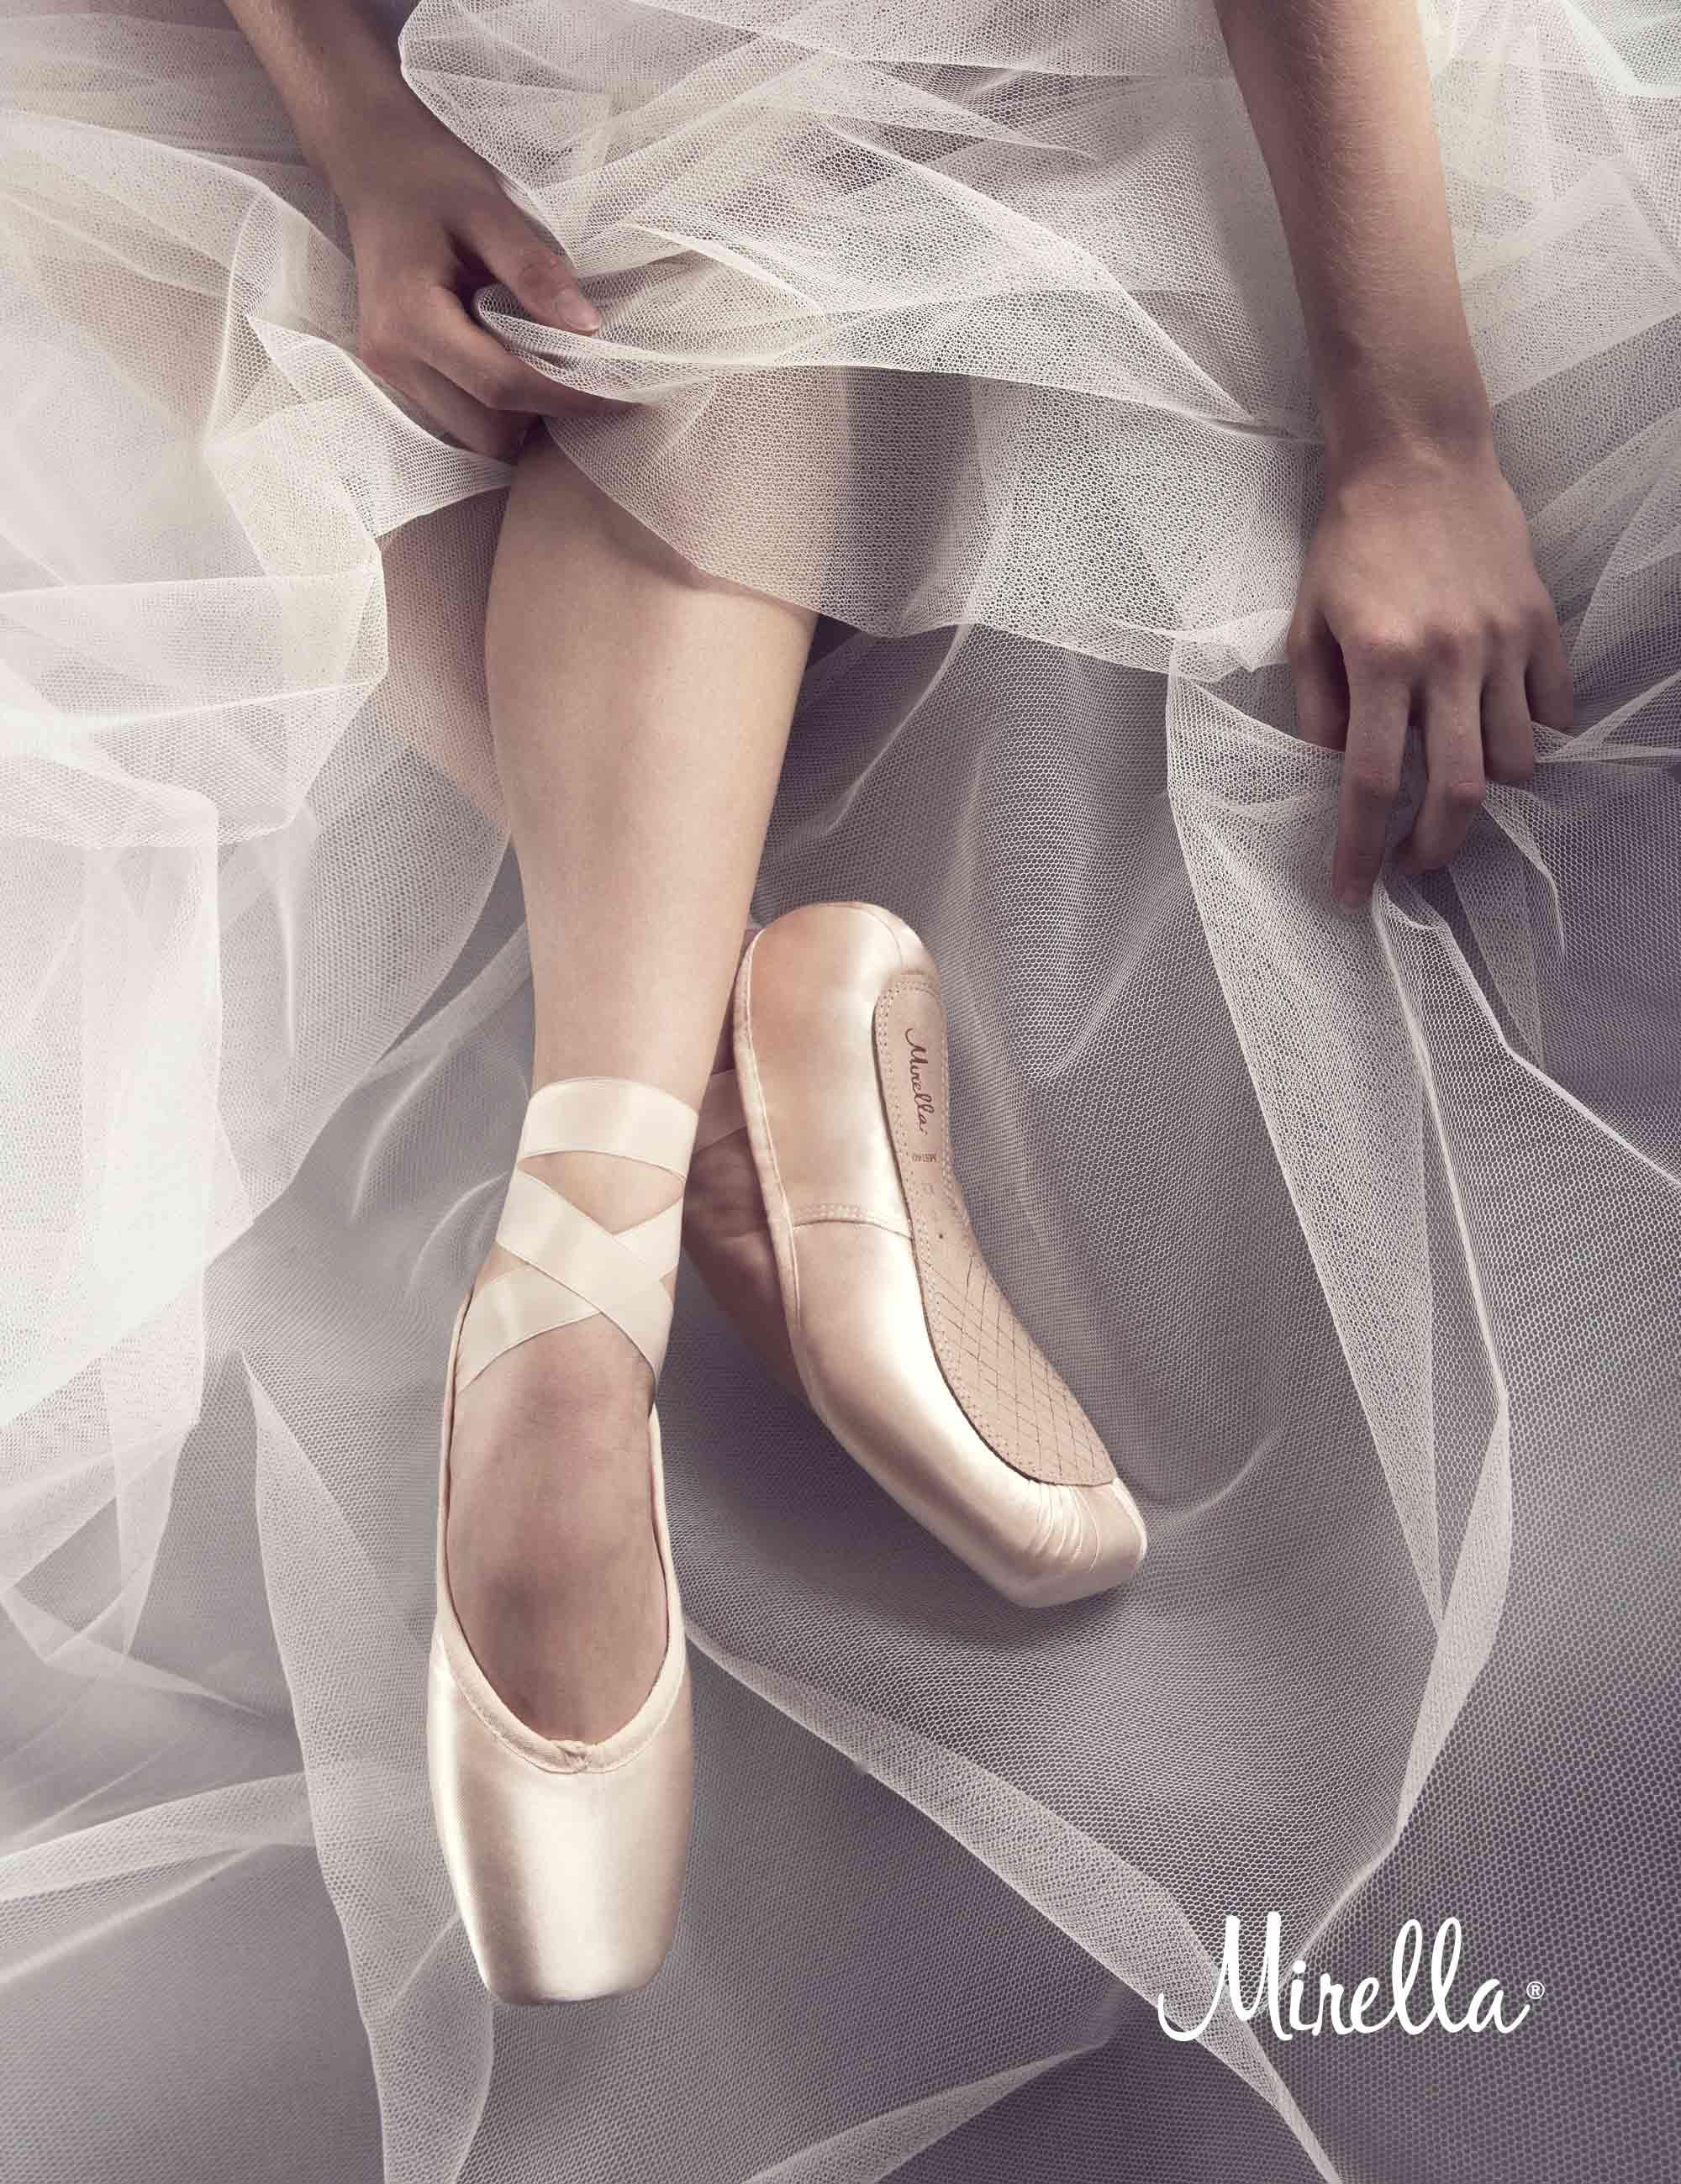 Mirella Whisper Pointe Shoe